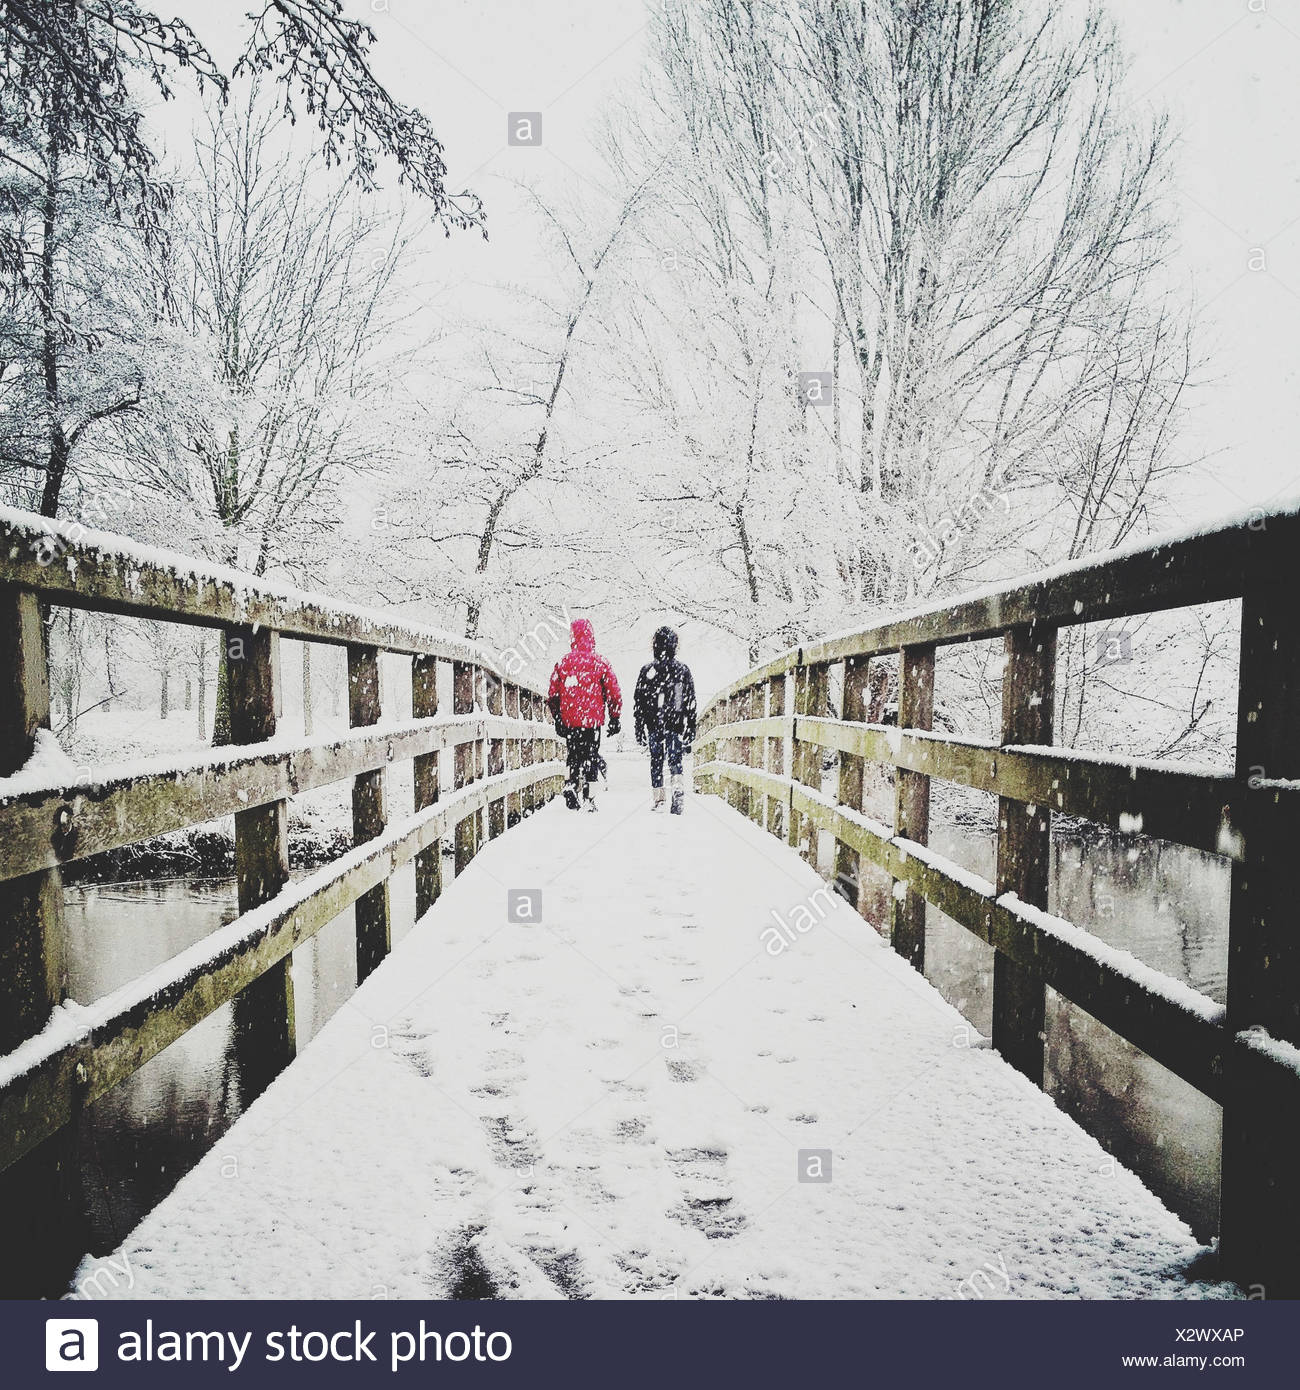 Rear view of two children walking across footbridge - Stock Image